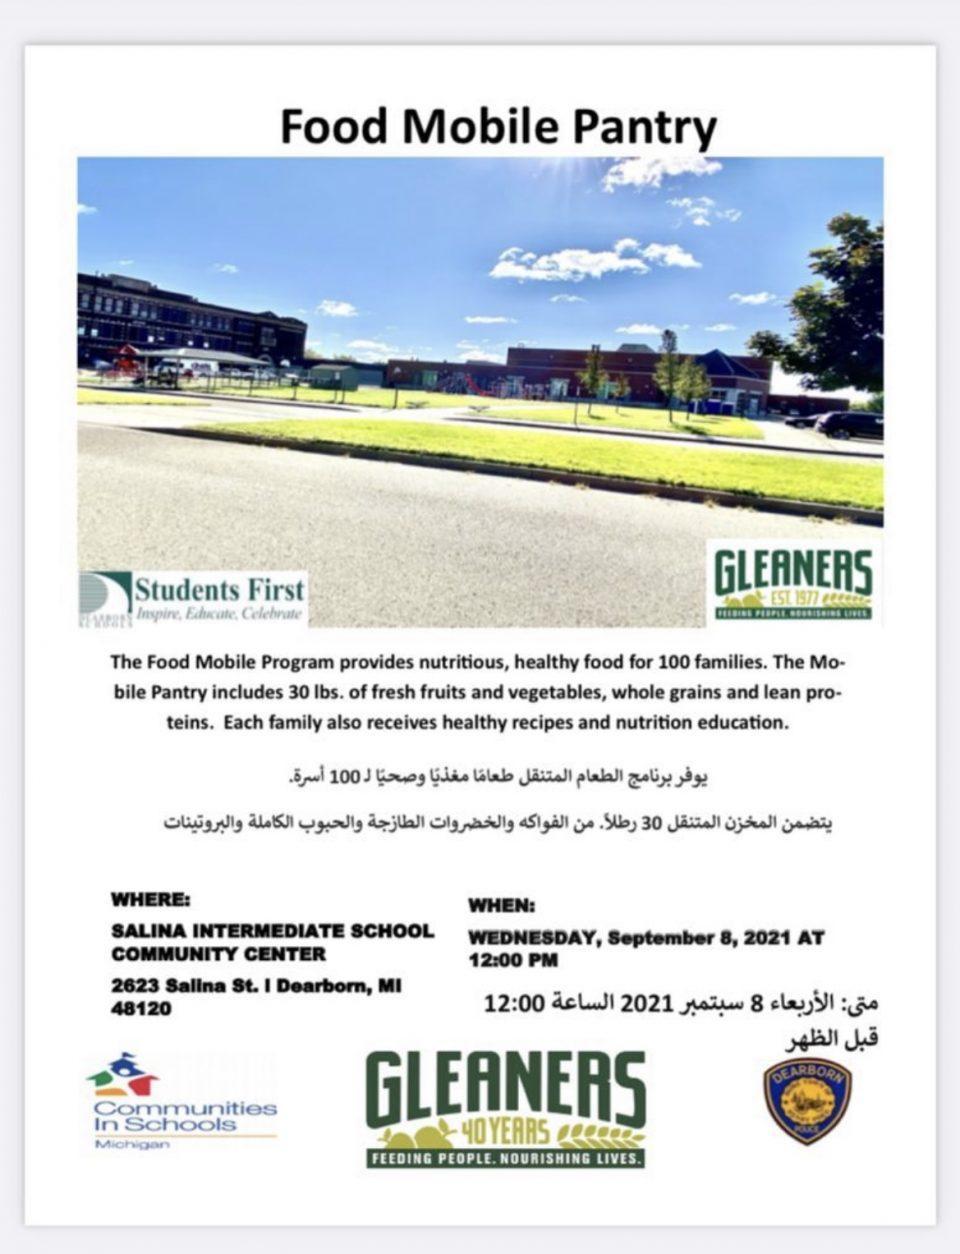 Mobile Food Pantry Tomorrow September 8 at 12 PM